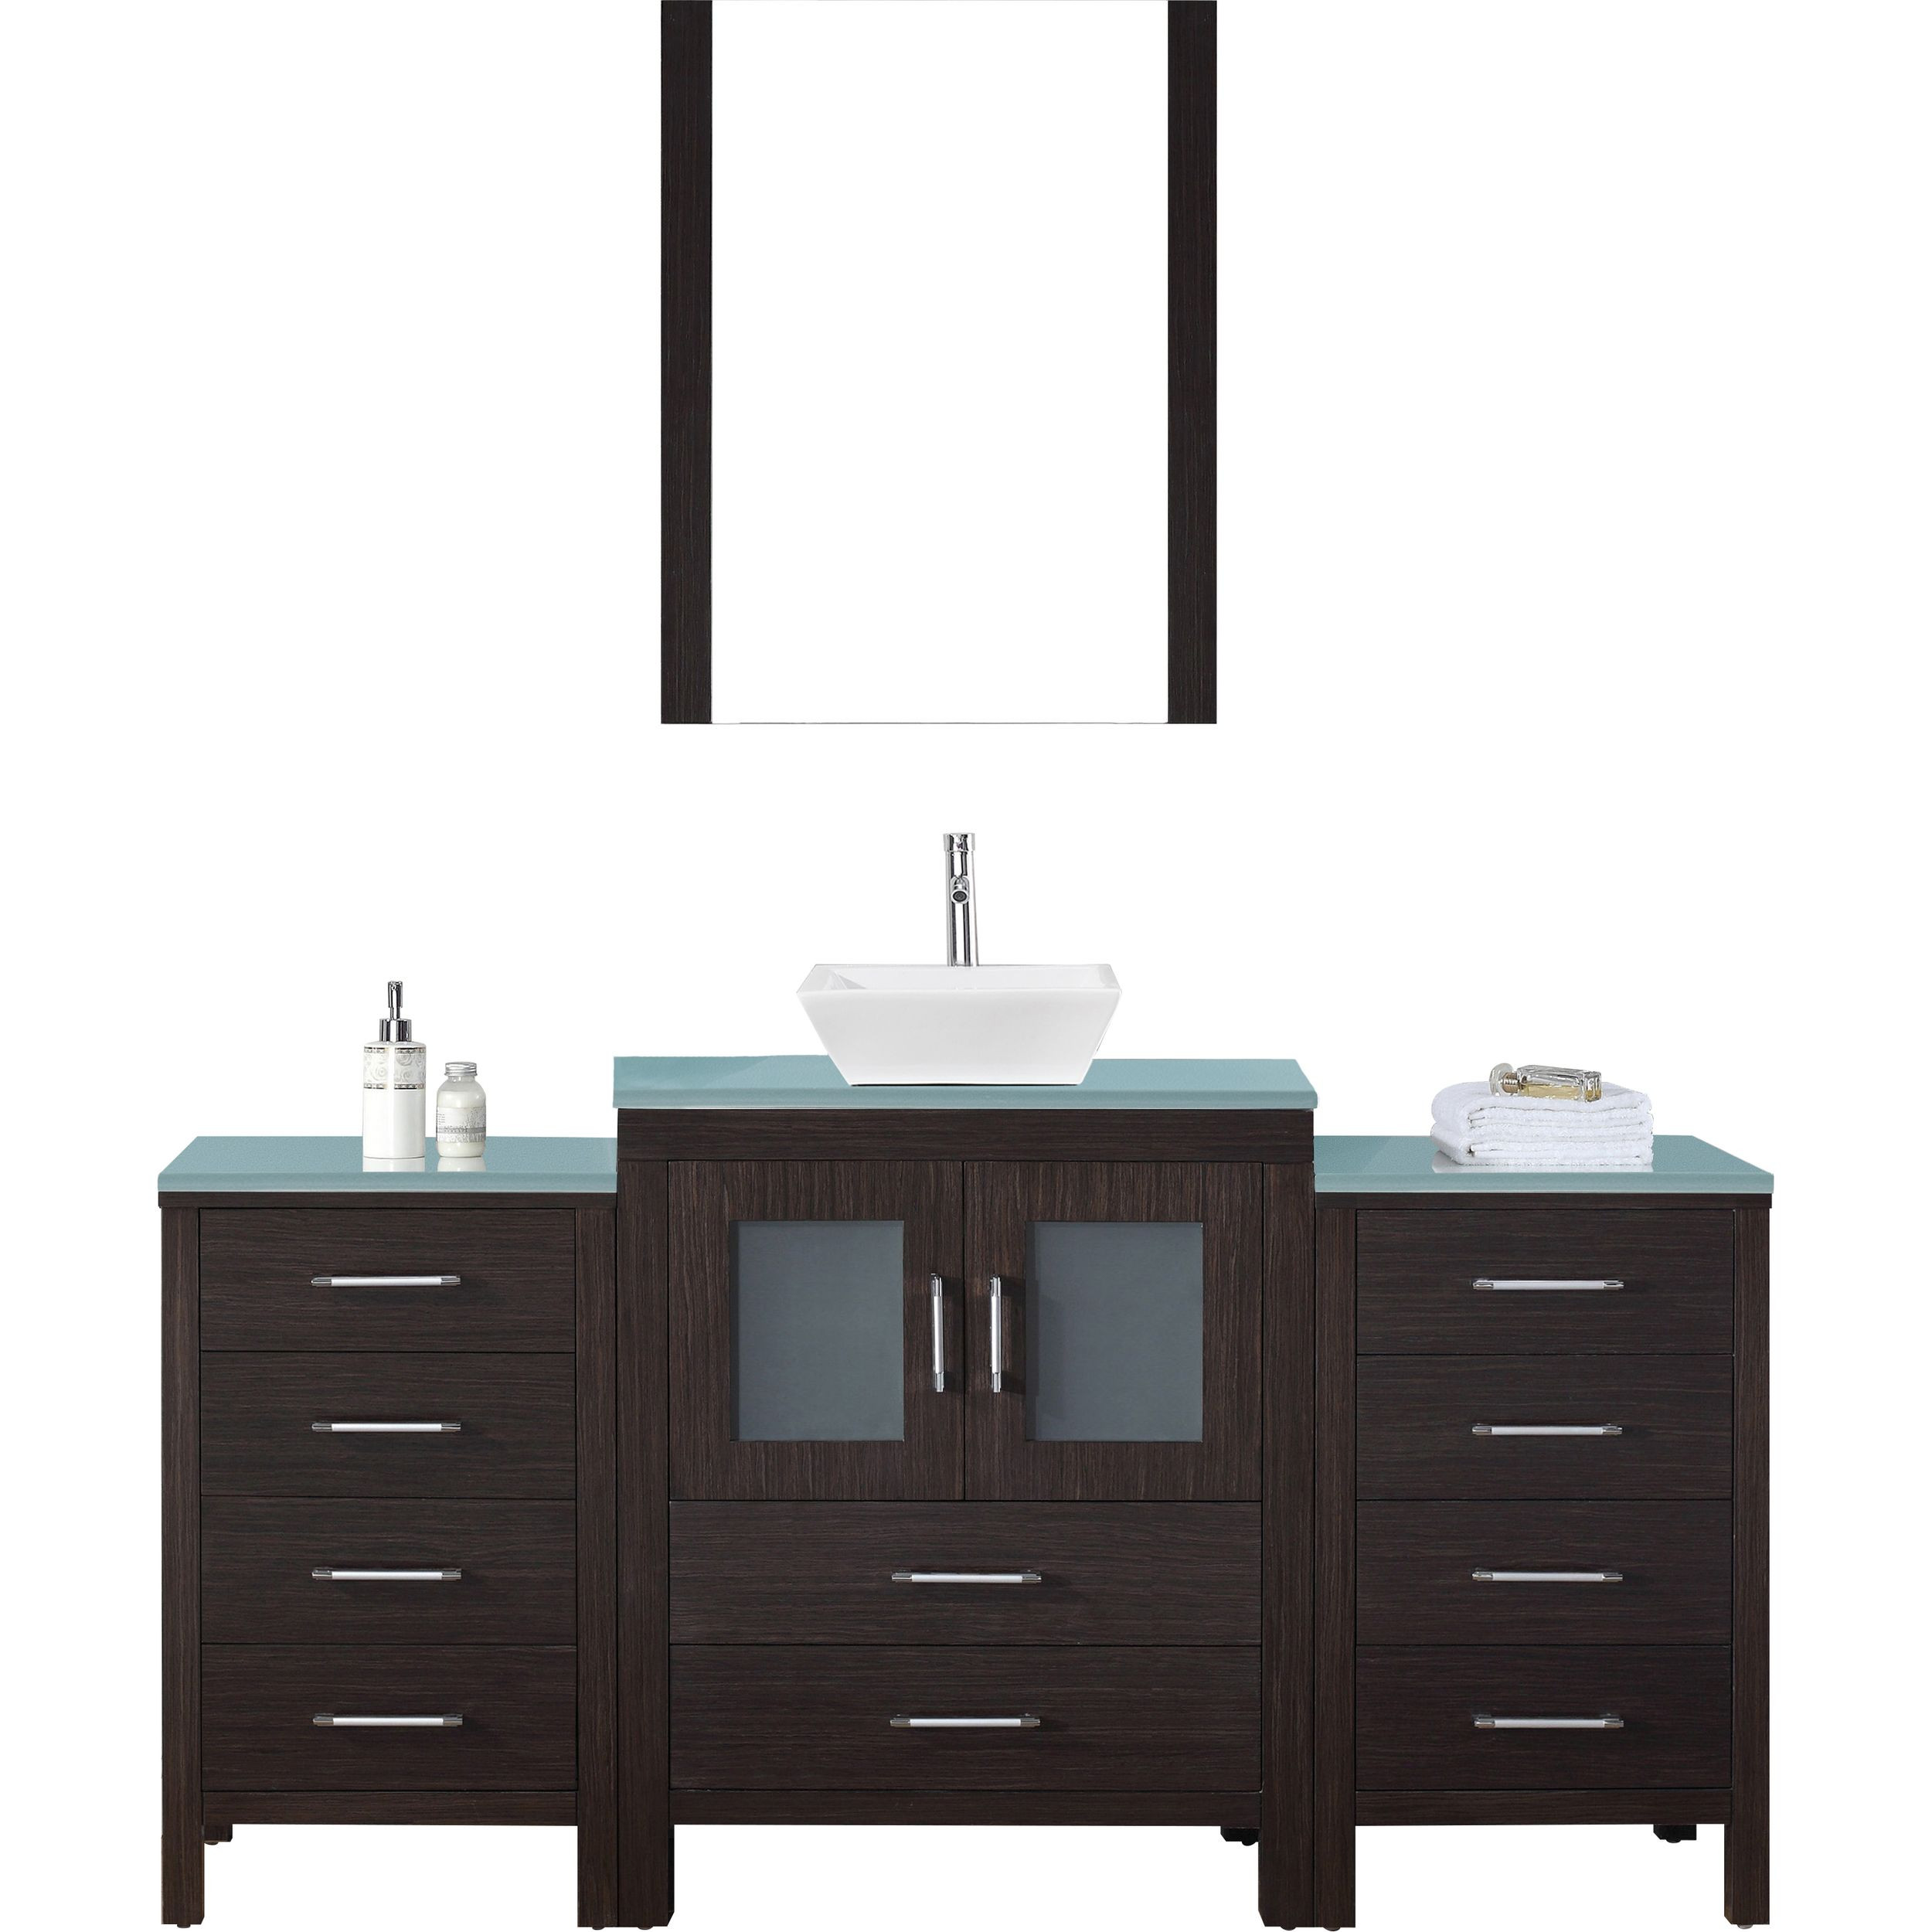 Virtu KS-70064-G-ES Dior 64 Inch Single Bathroom Vanity Set In Espresso